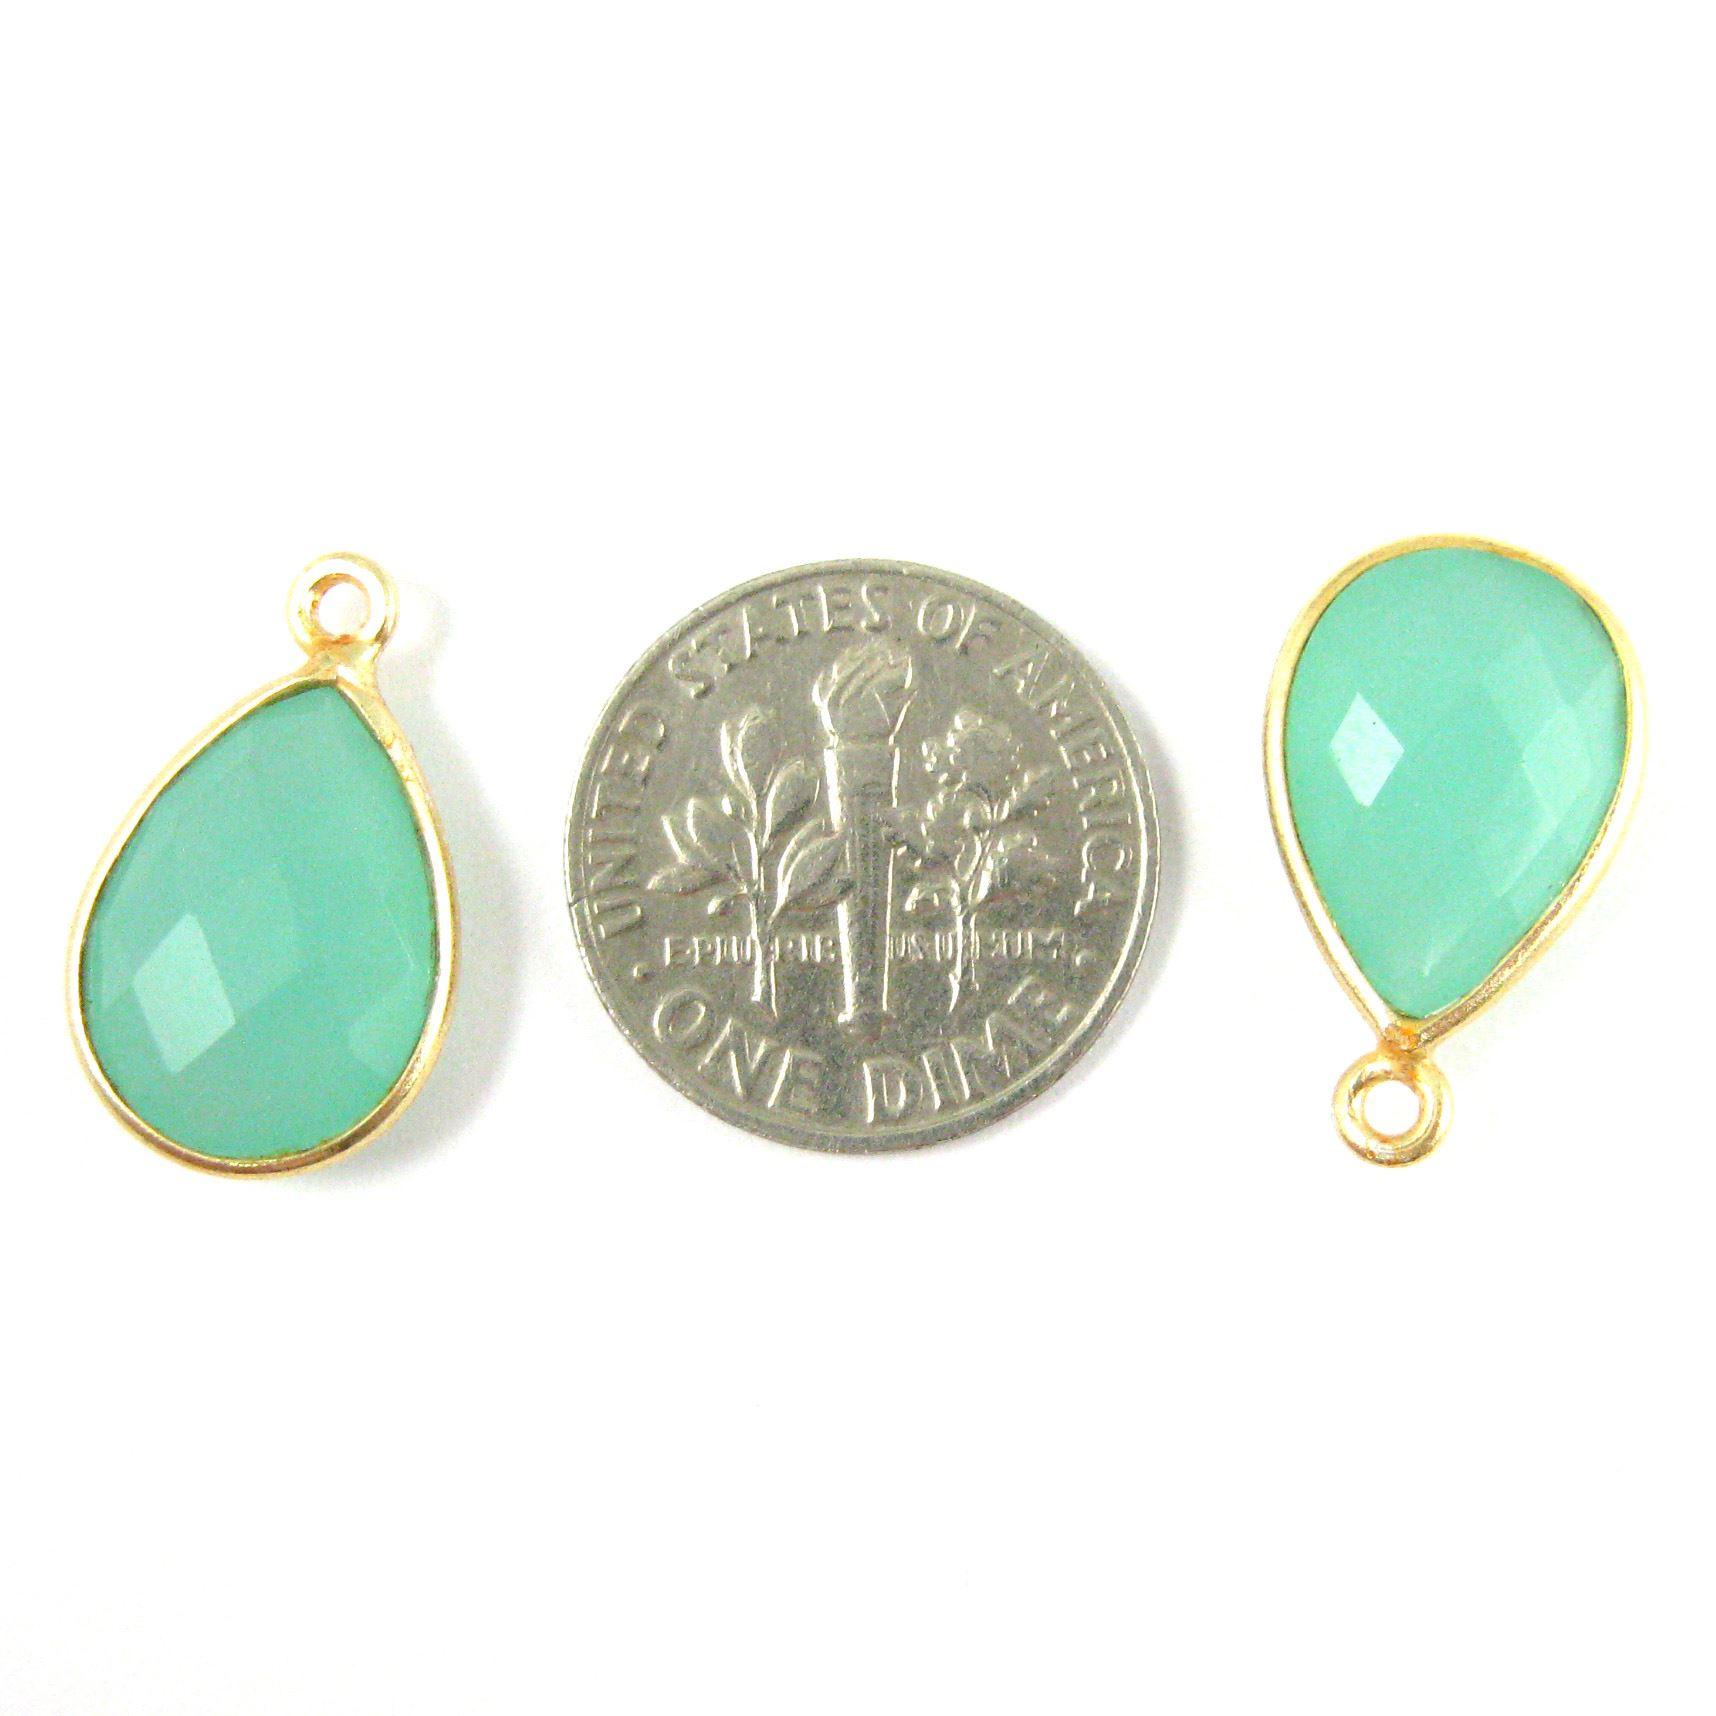 Bezel Gemstone Pendant - 10x14mm Faceted Small Teardop Shape - Peru Chalcedony  (Sold per 2 pieces)